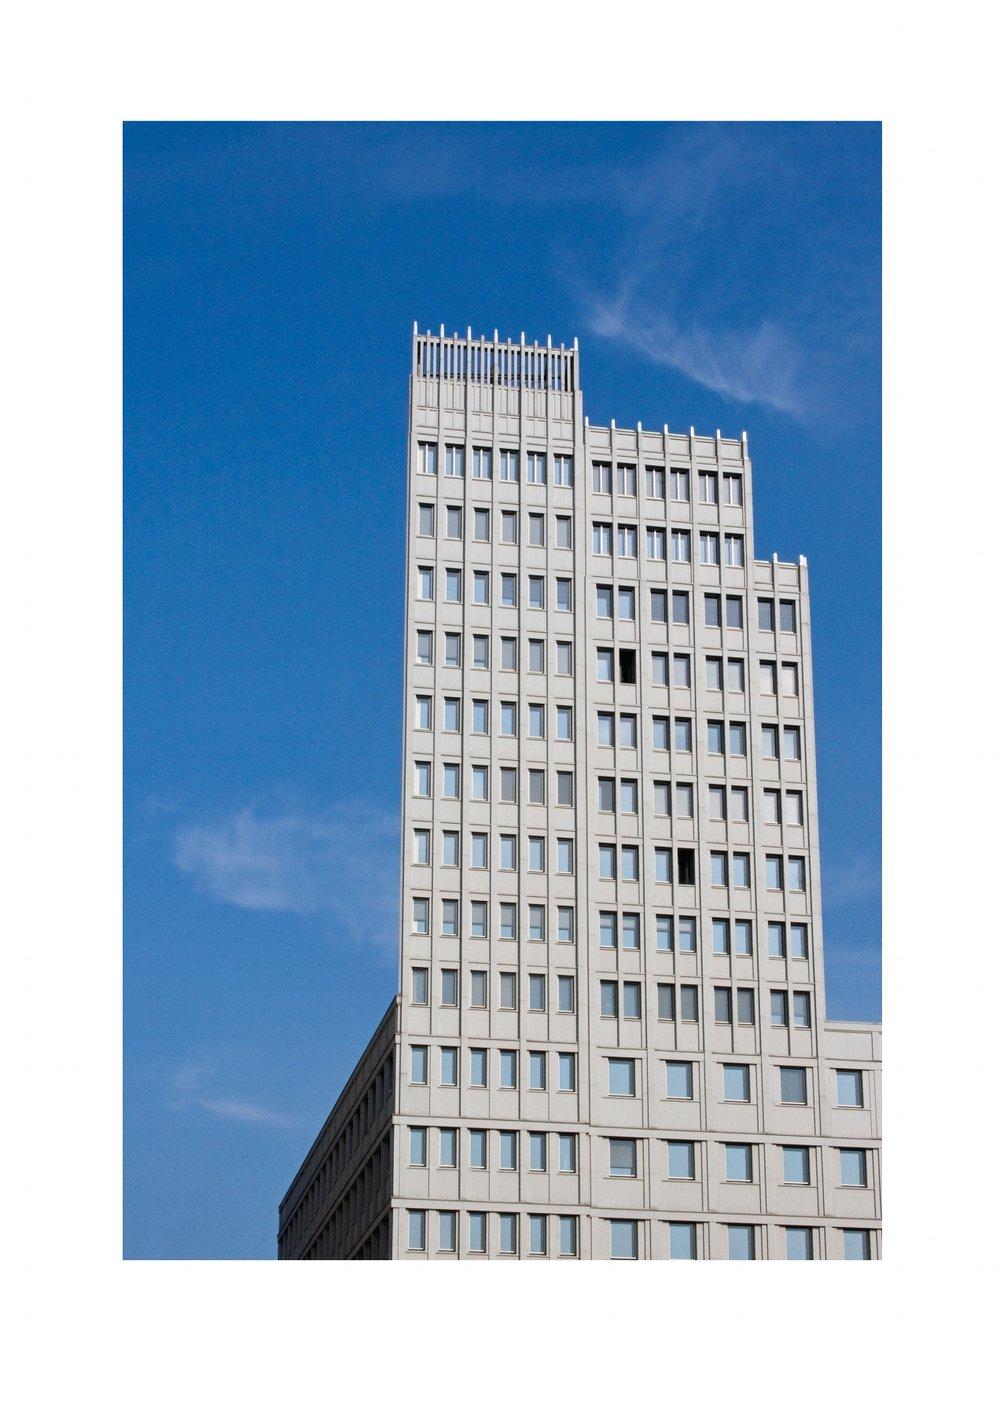 Berlin_flat building.jpg